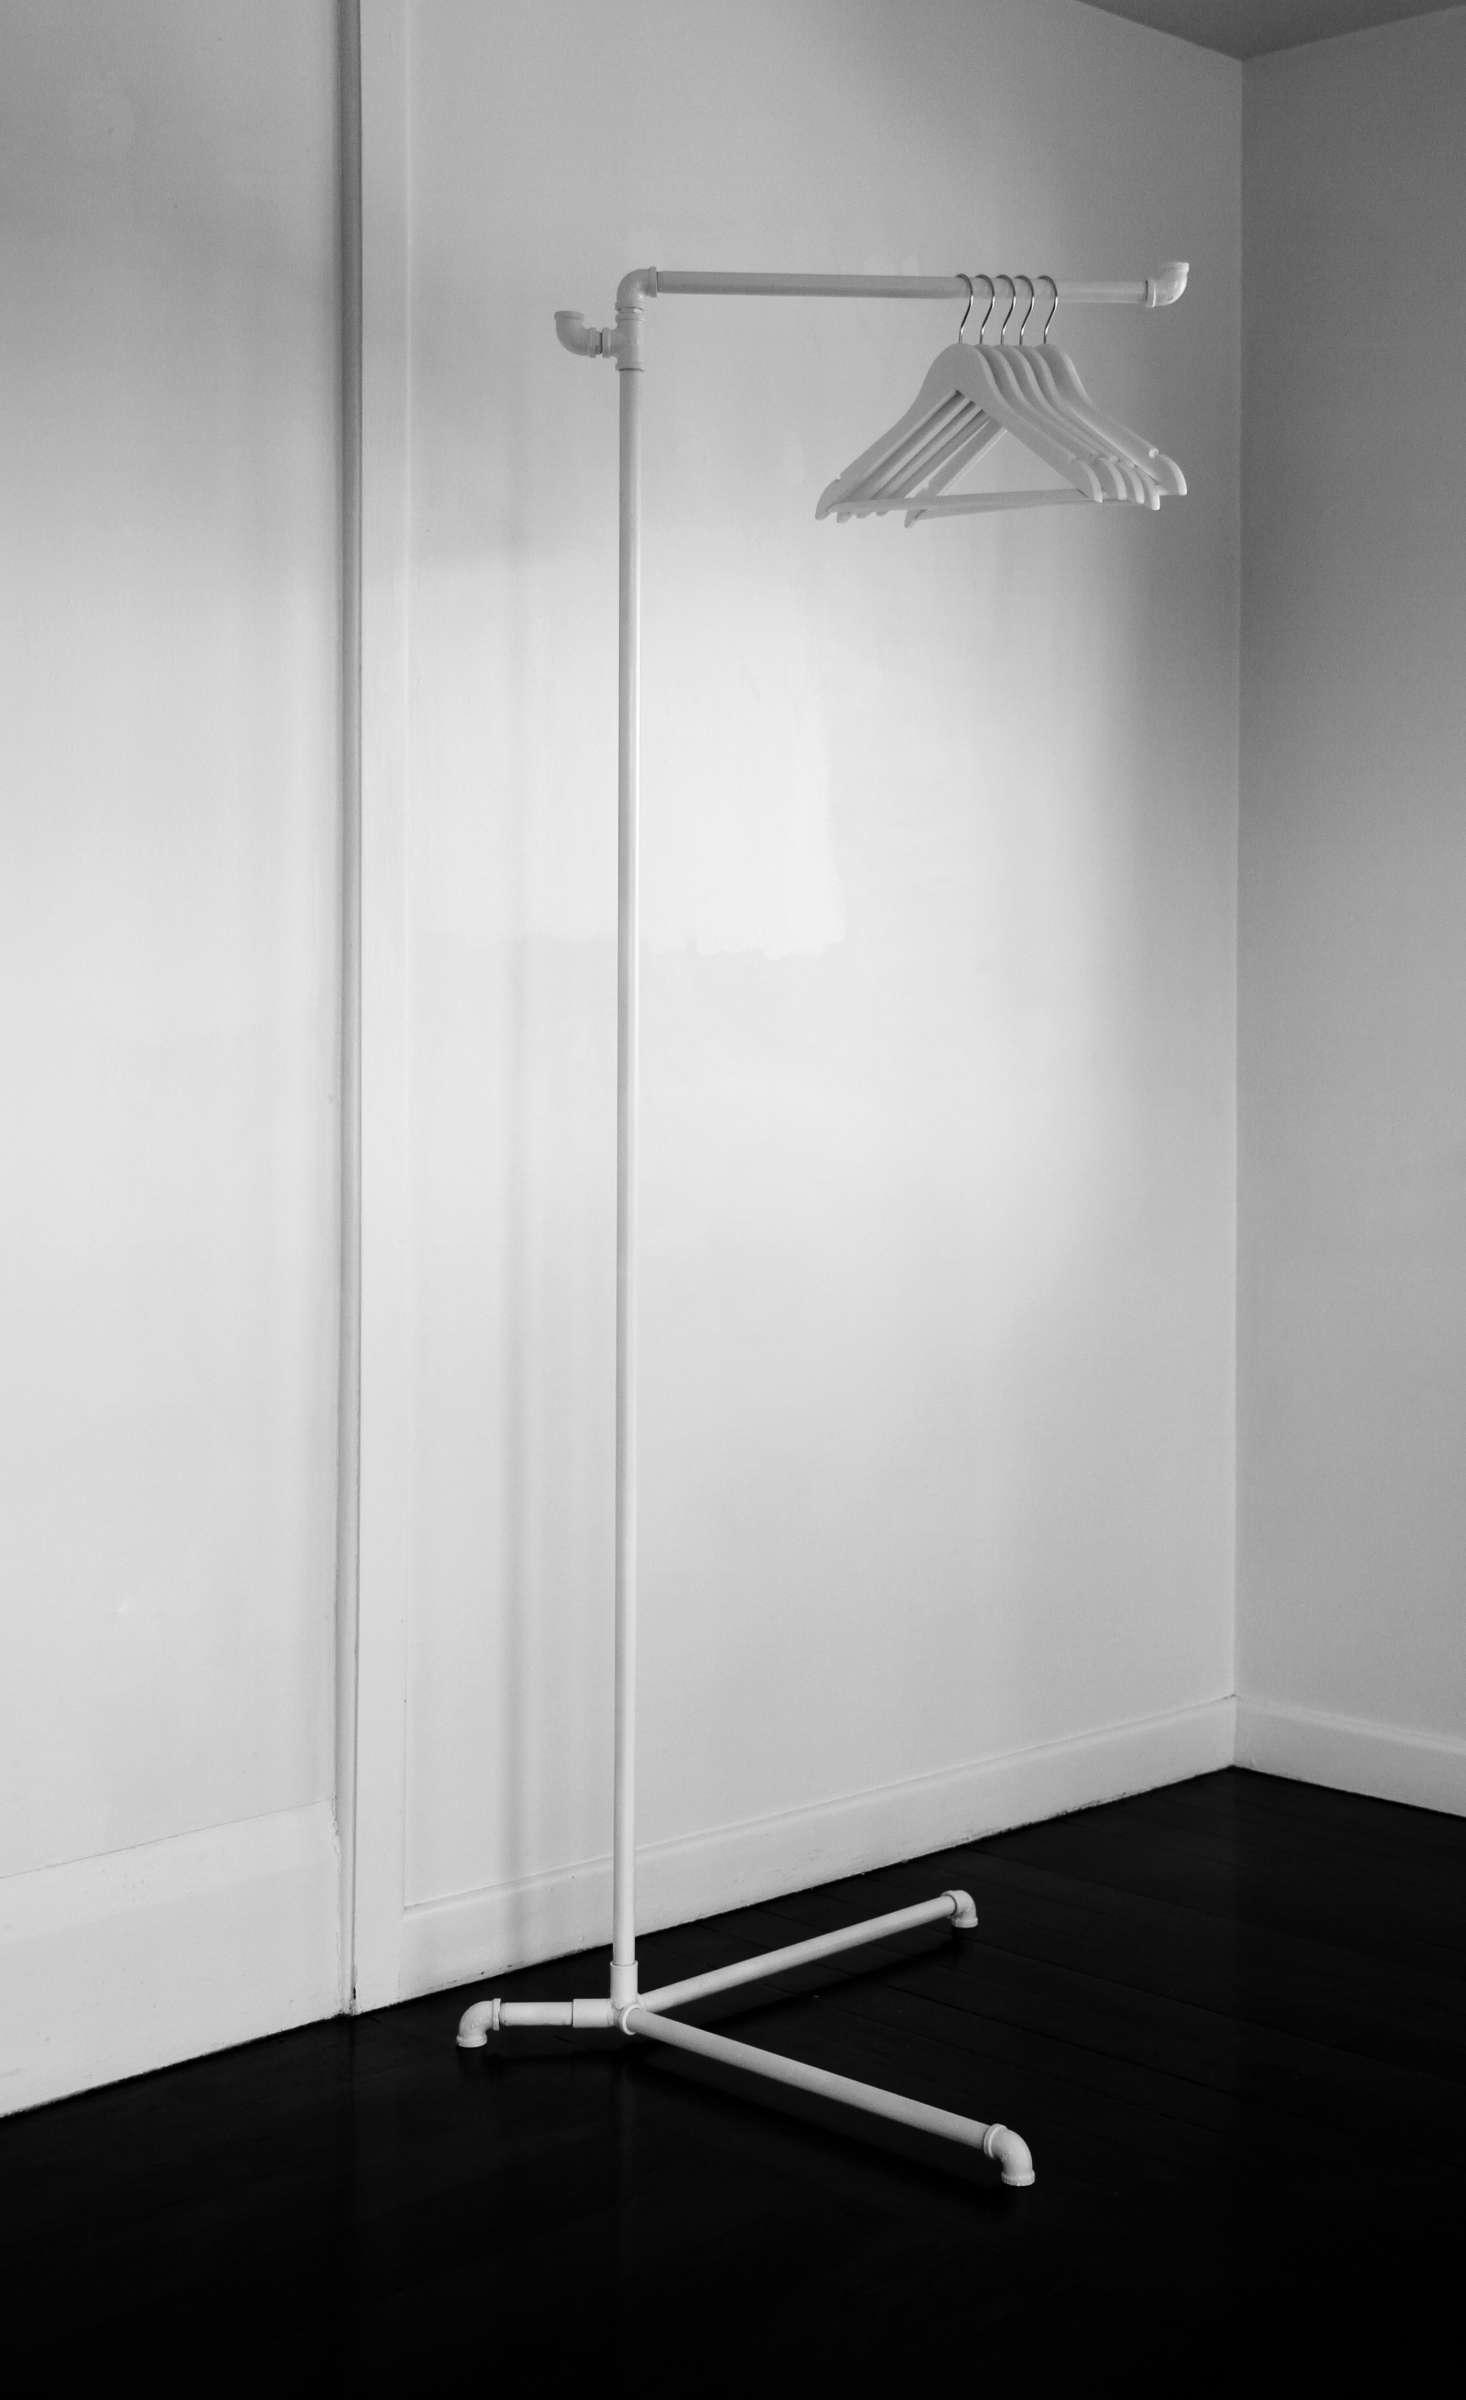 Hang It Anywhere: Bespoke Clothing Racks from New Zealand